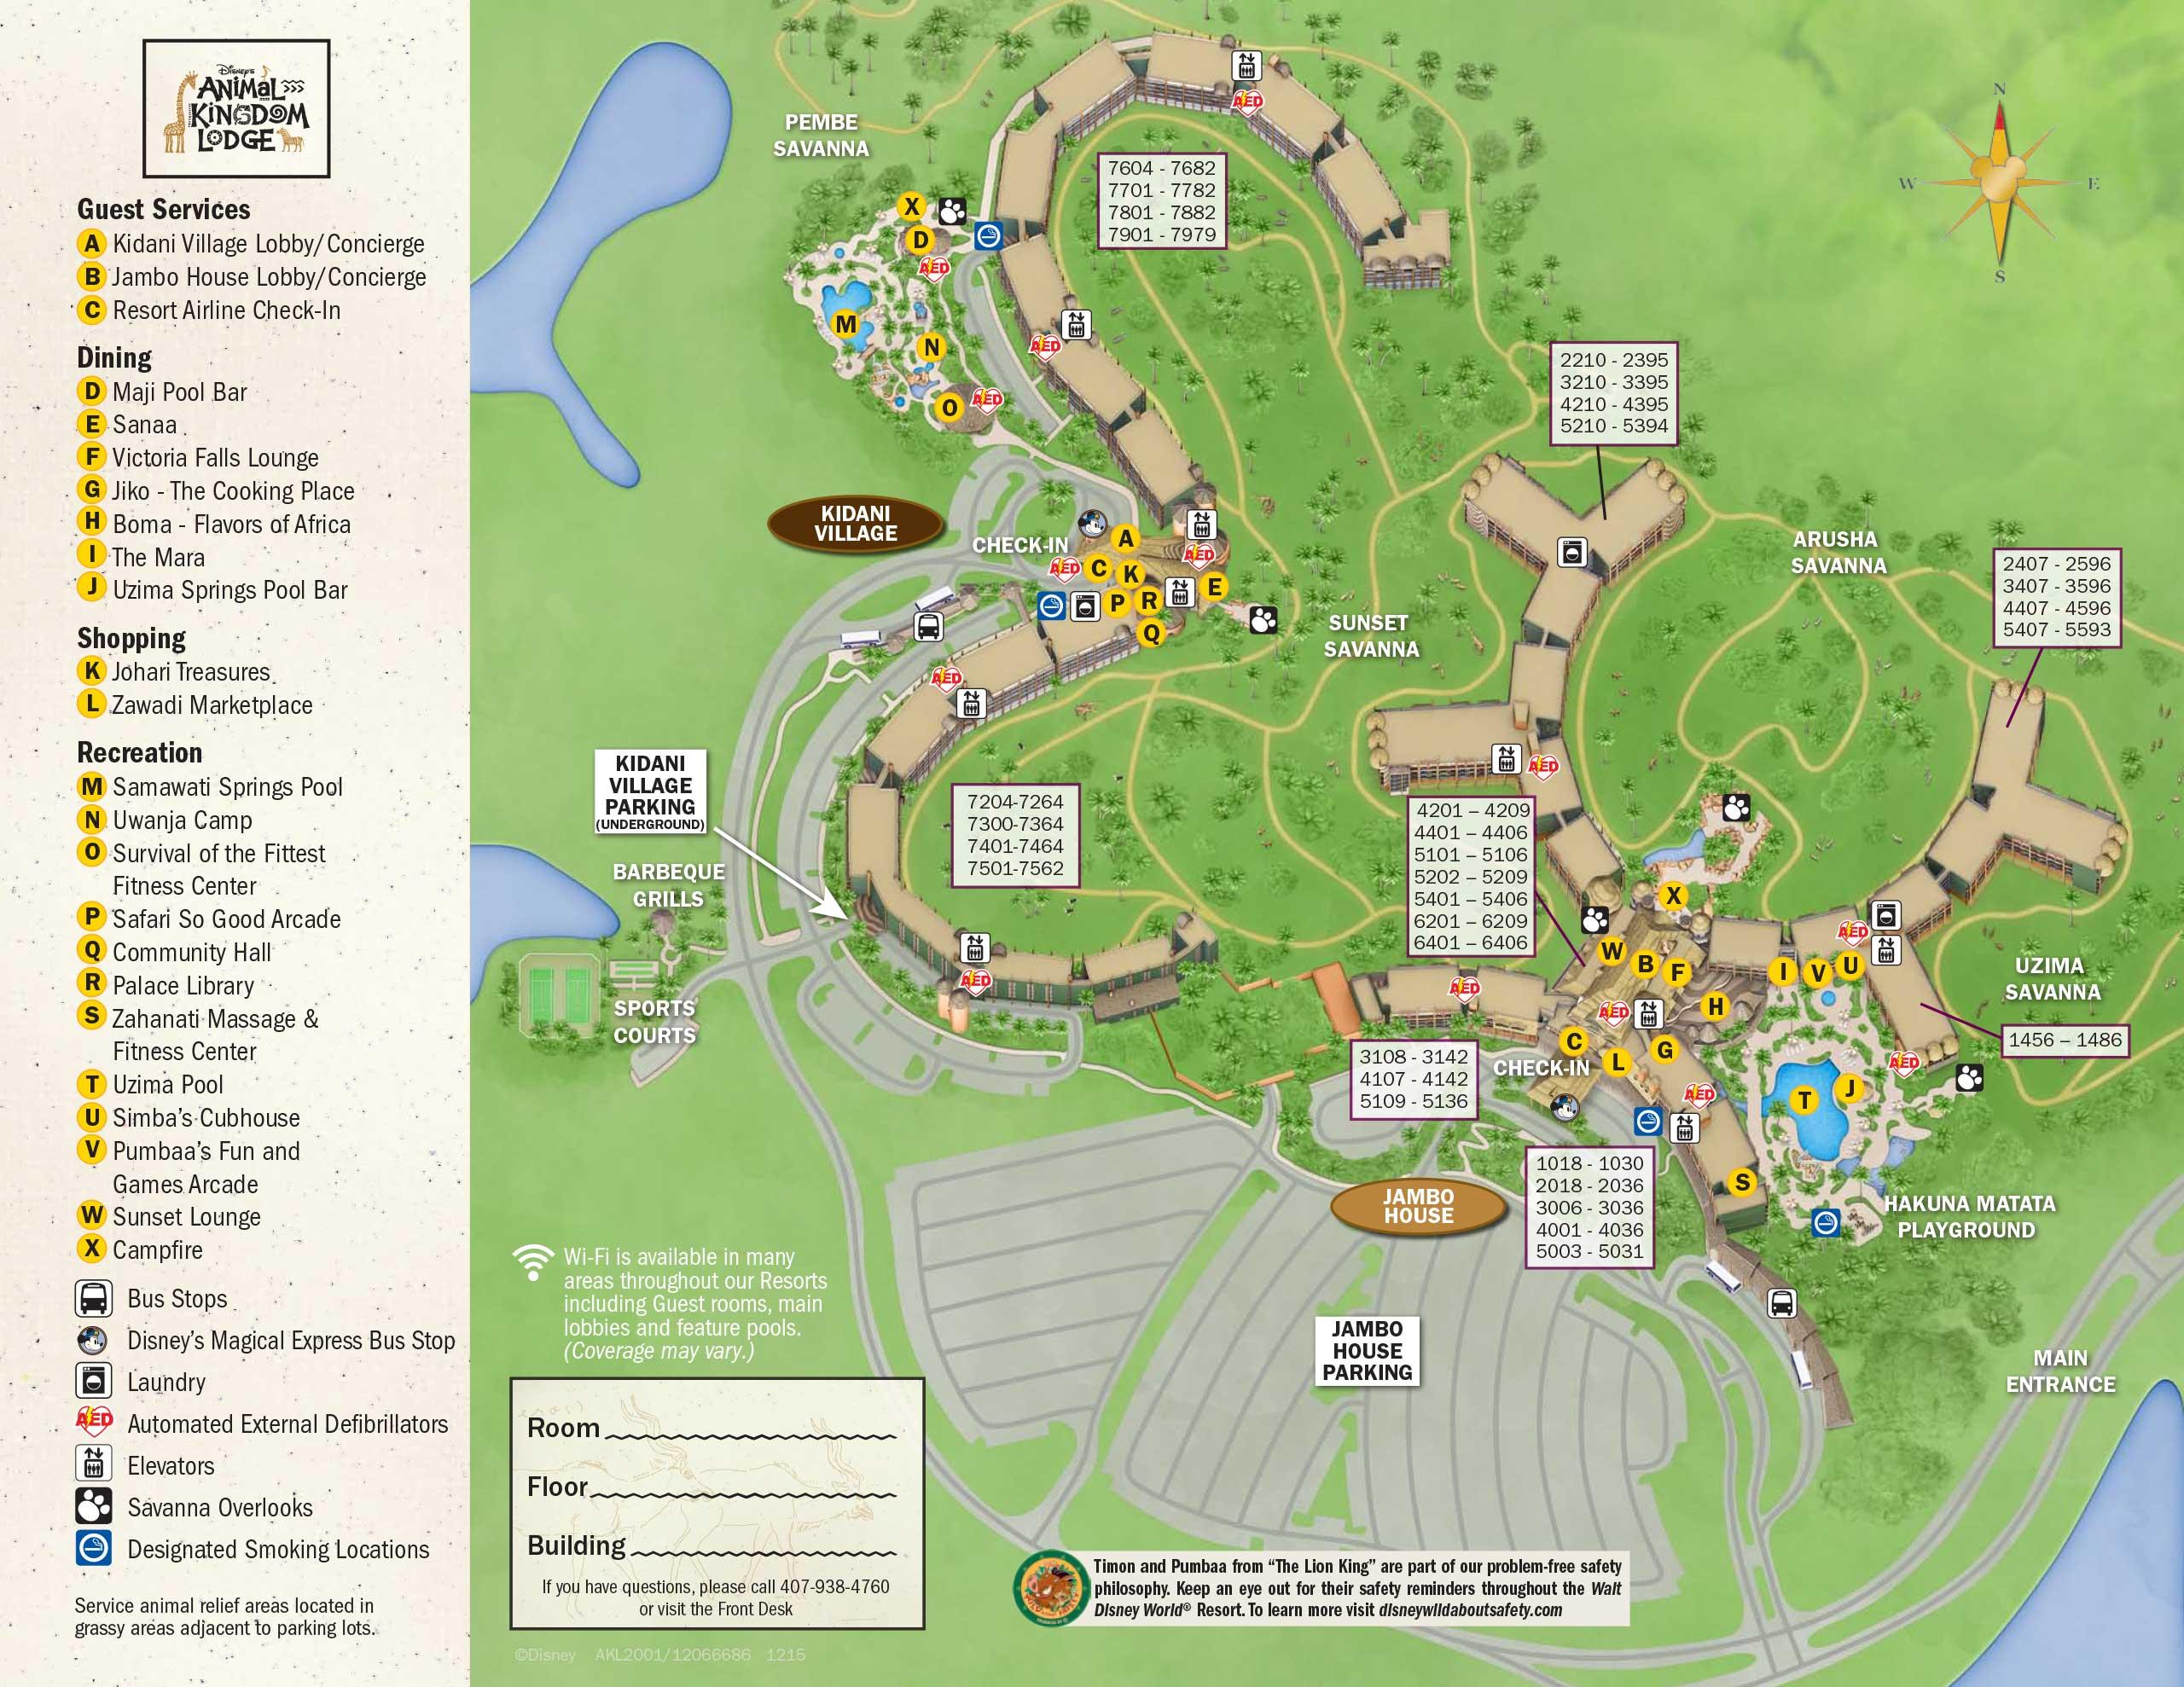 April 2017 Walt Disney World Resort Hotel Maps Photo 22 Of 33: Disney World Hotels Map At Slyspyder.com